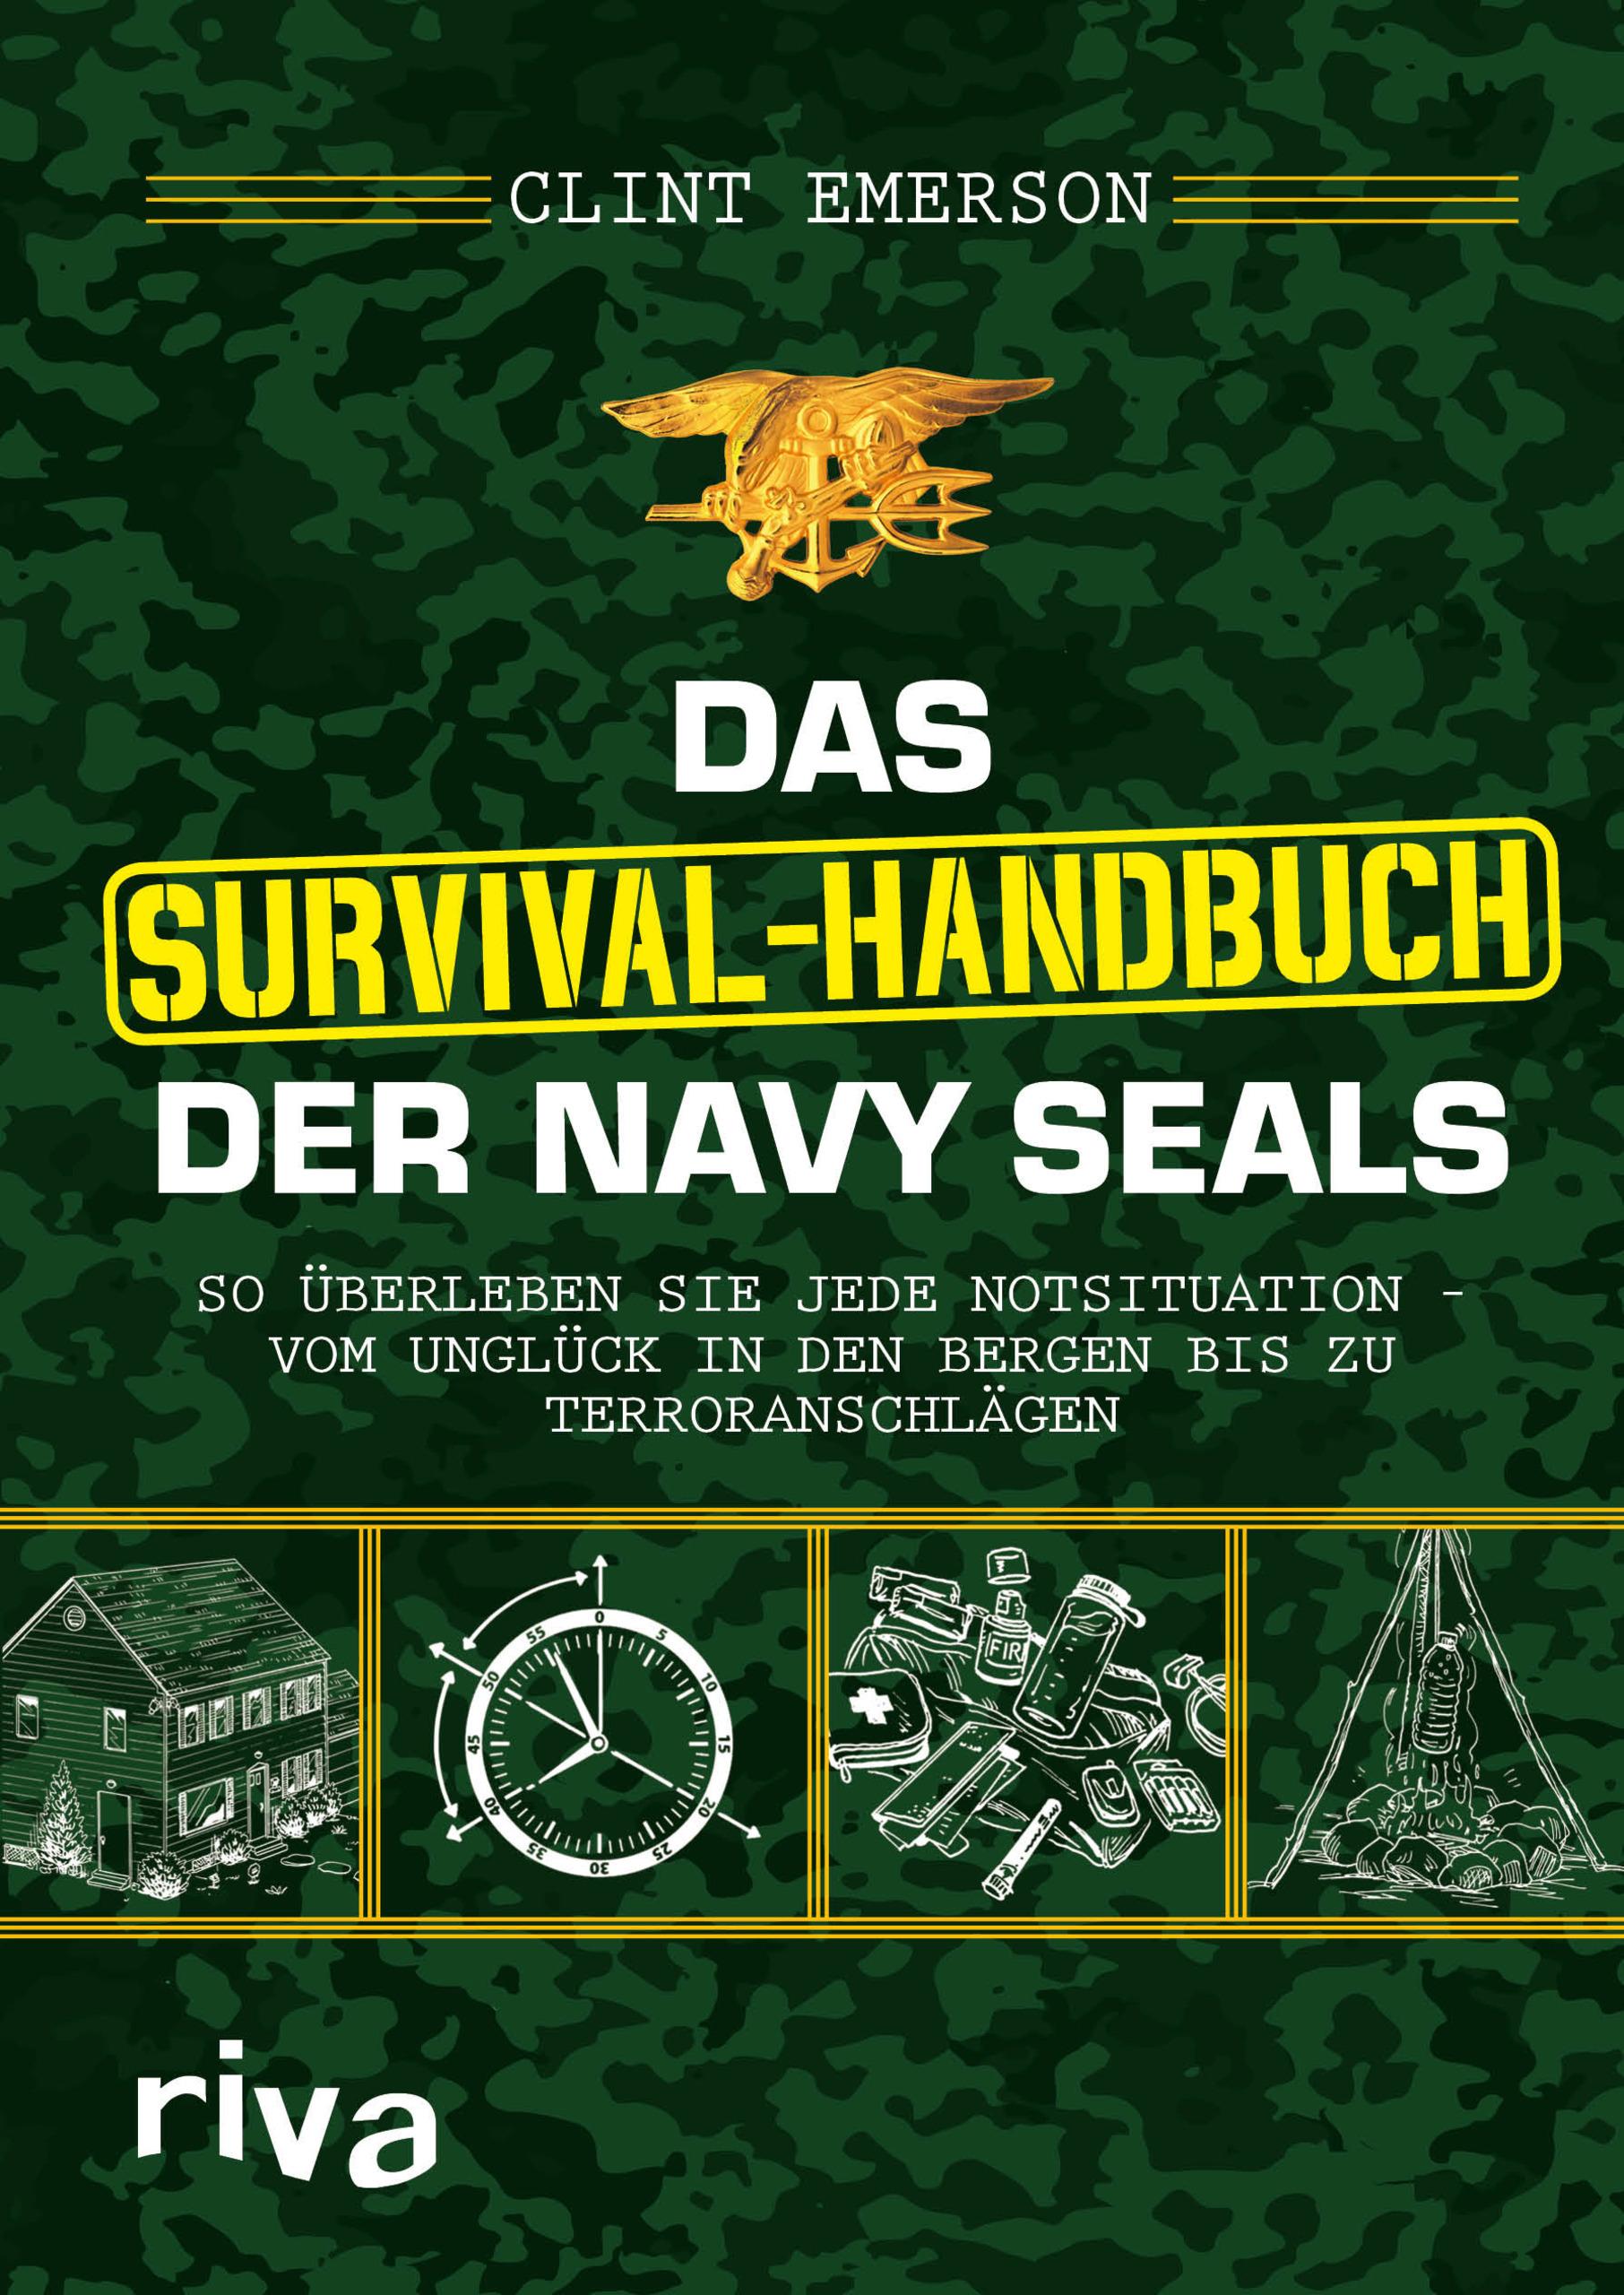 das survival handbuch der navy seals vs medien online shop. Black Bedroom Furniture Sets. Home Design Ideas